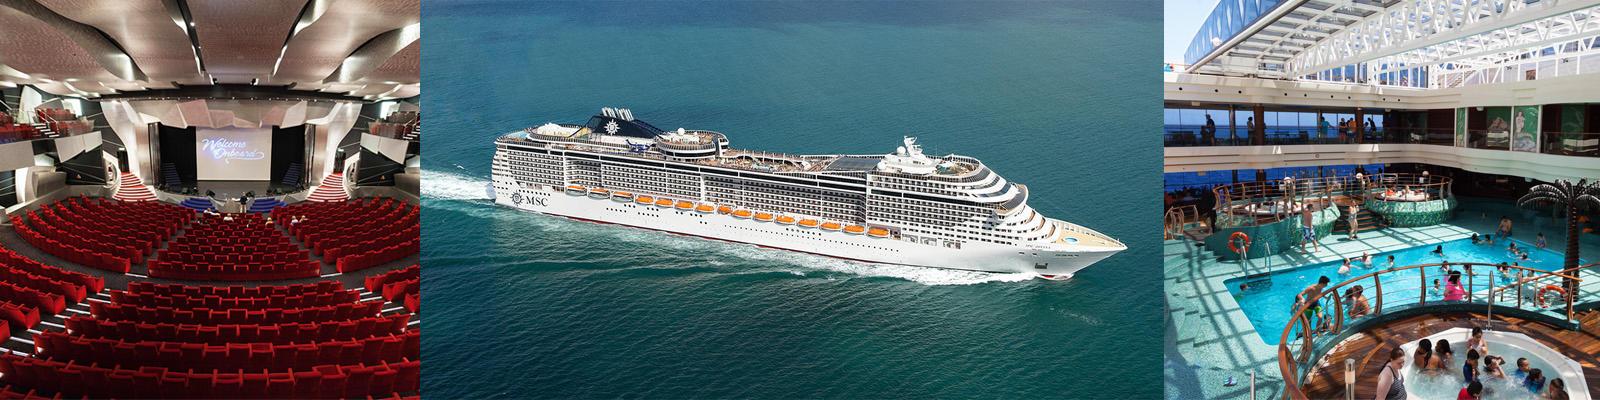 MSC Divina Cruise Ship Review Photos Departure Ports On Cruise - Msc divina cruise ship